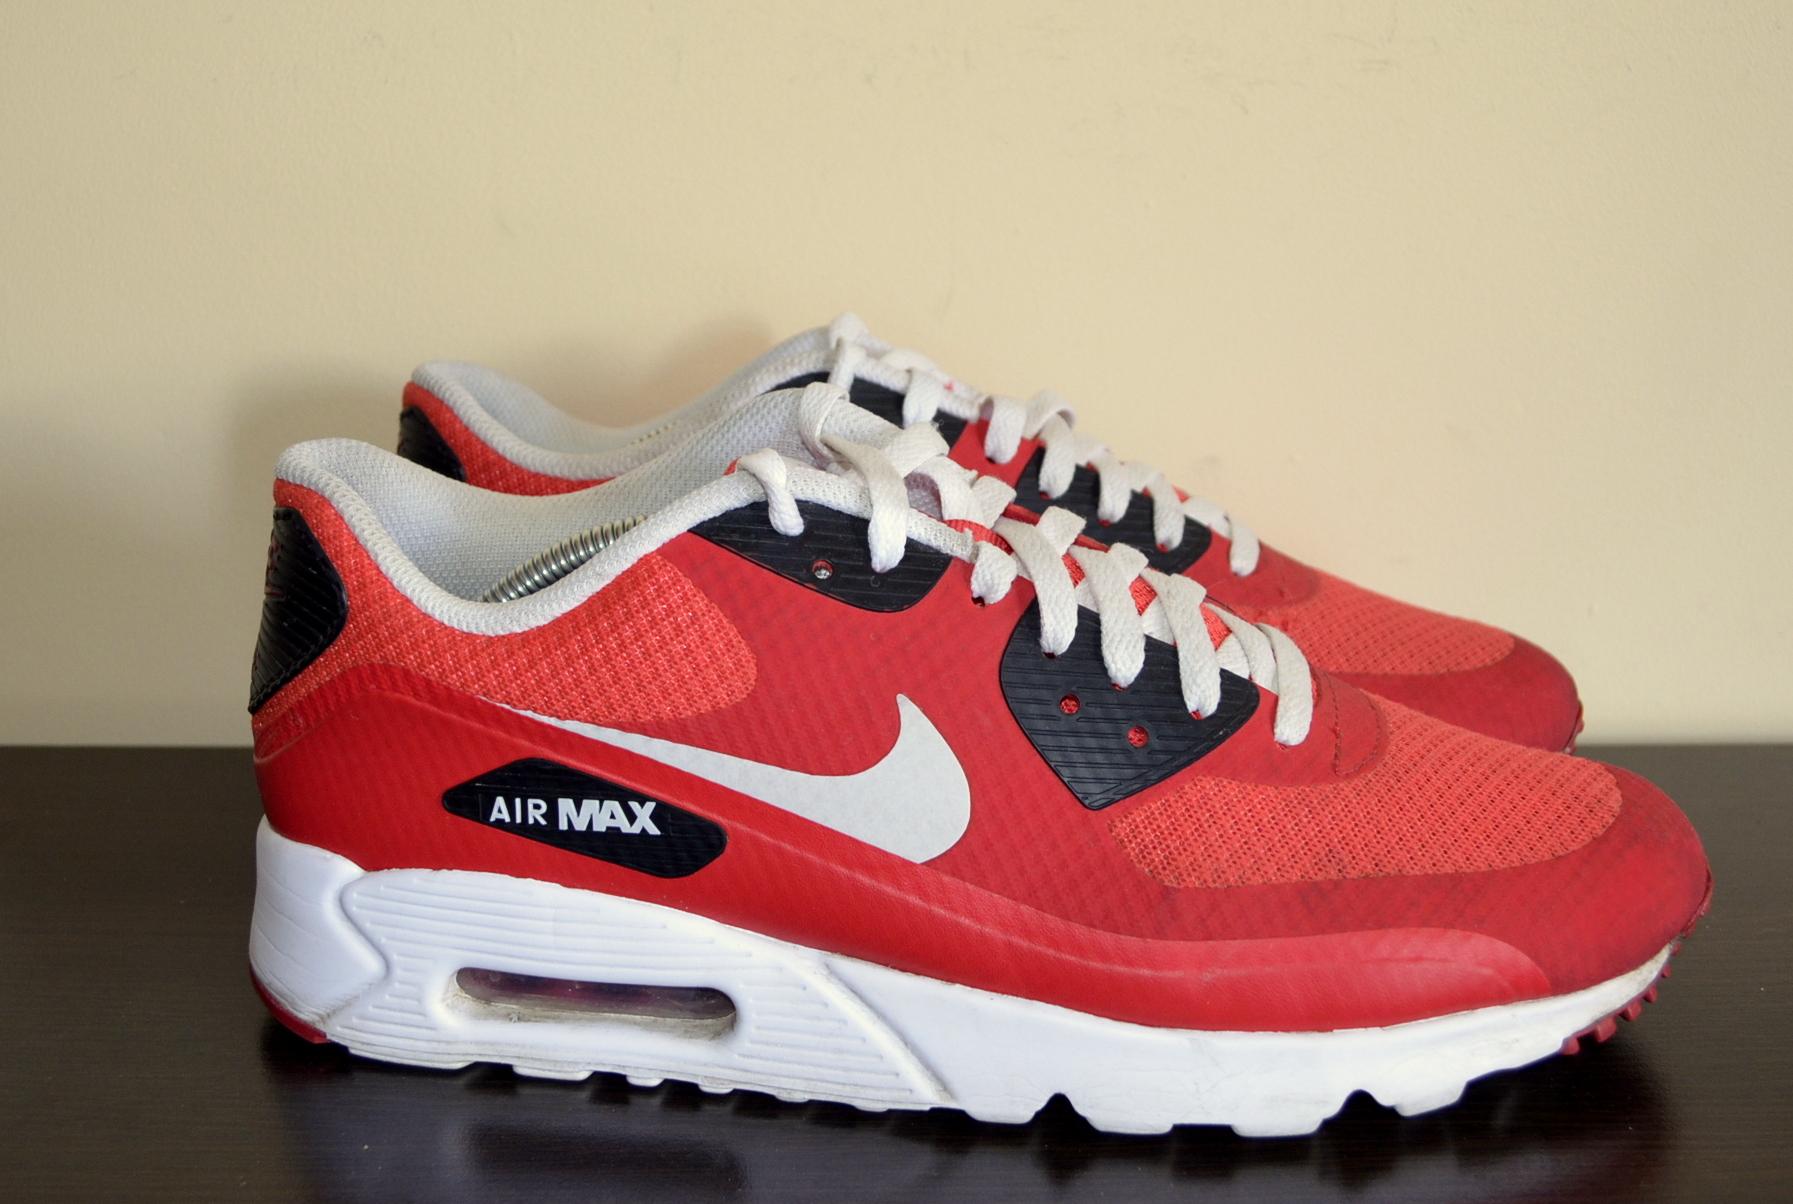 6a8b630649 Buty sportowe męskie Nike Air max 90 Ultra 44